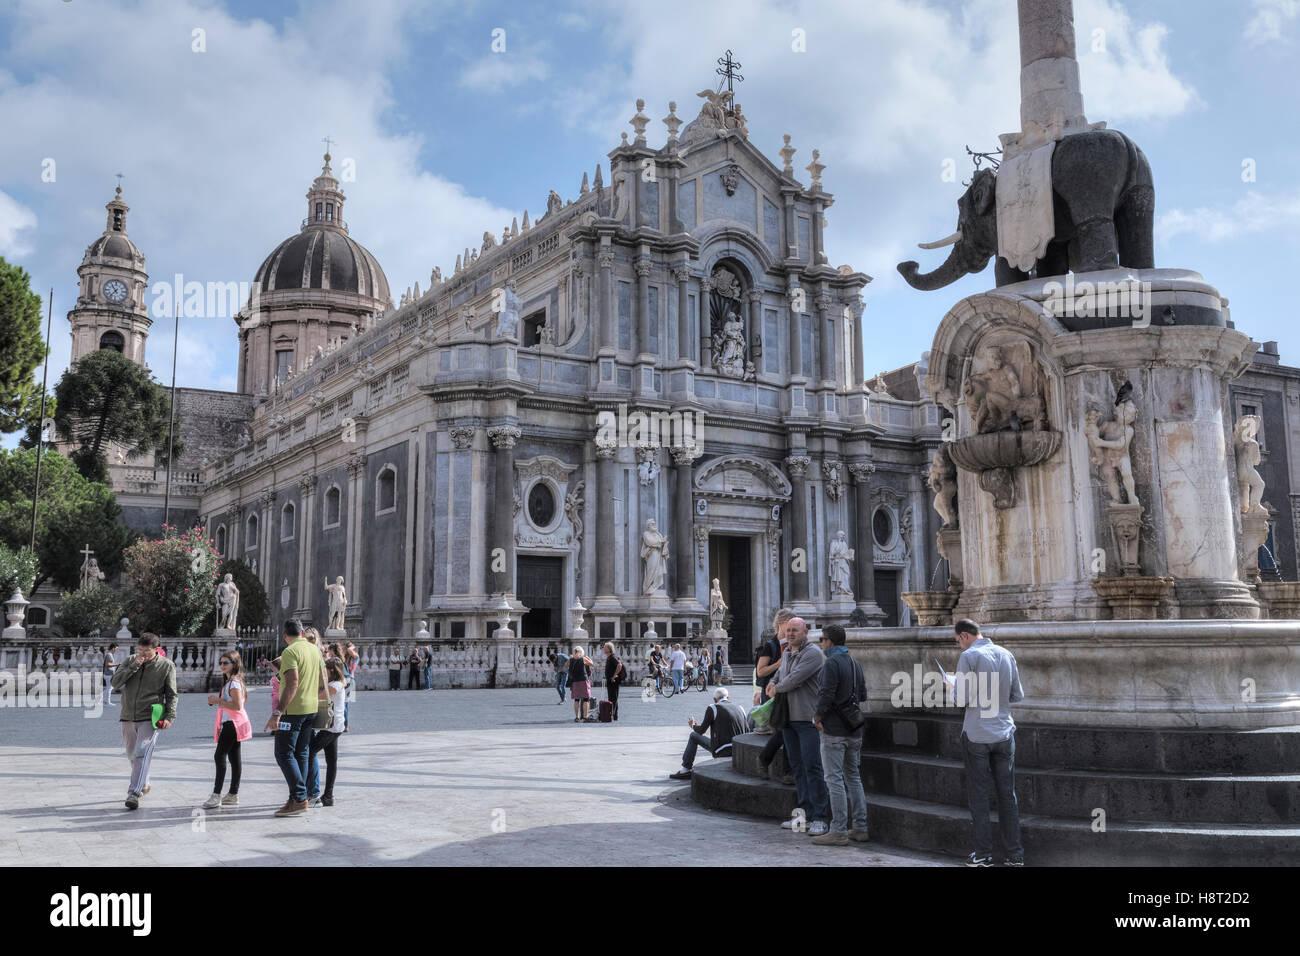 Piazza Duomo, Fontana dell'Elefante, Catania, Sicily, Italy - Stock Image